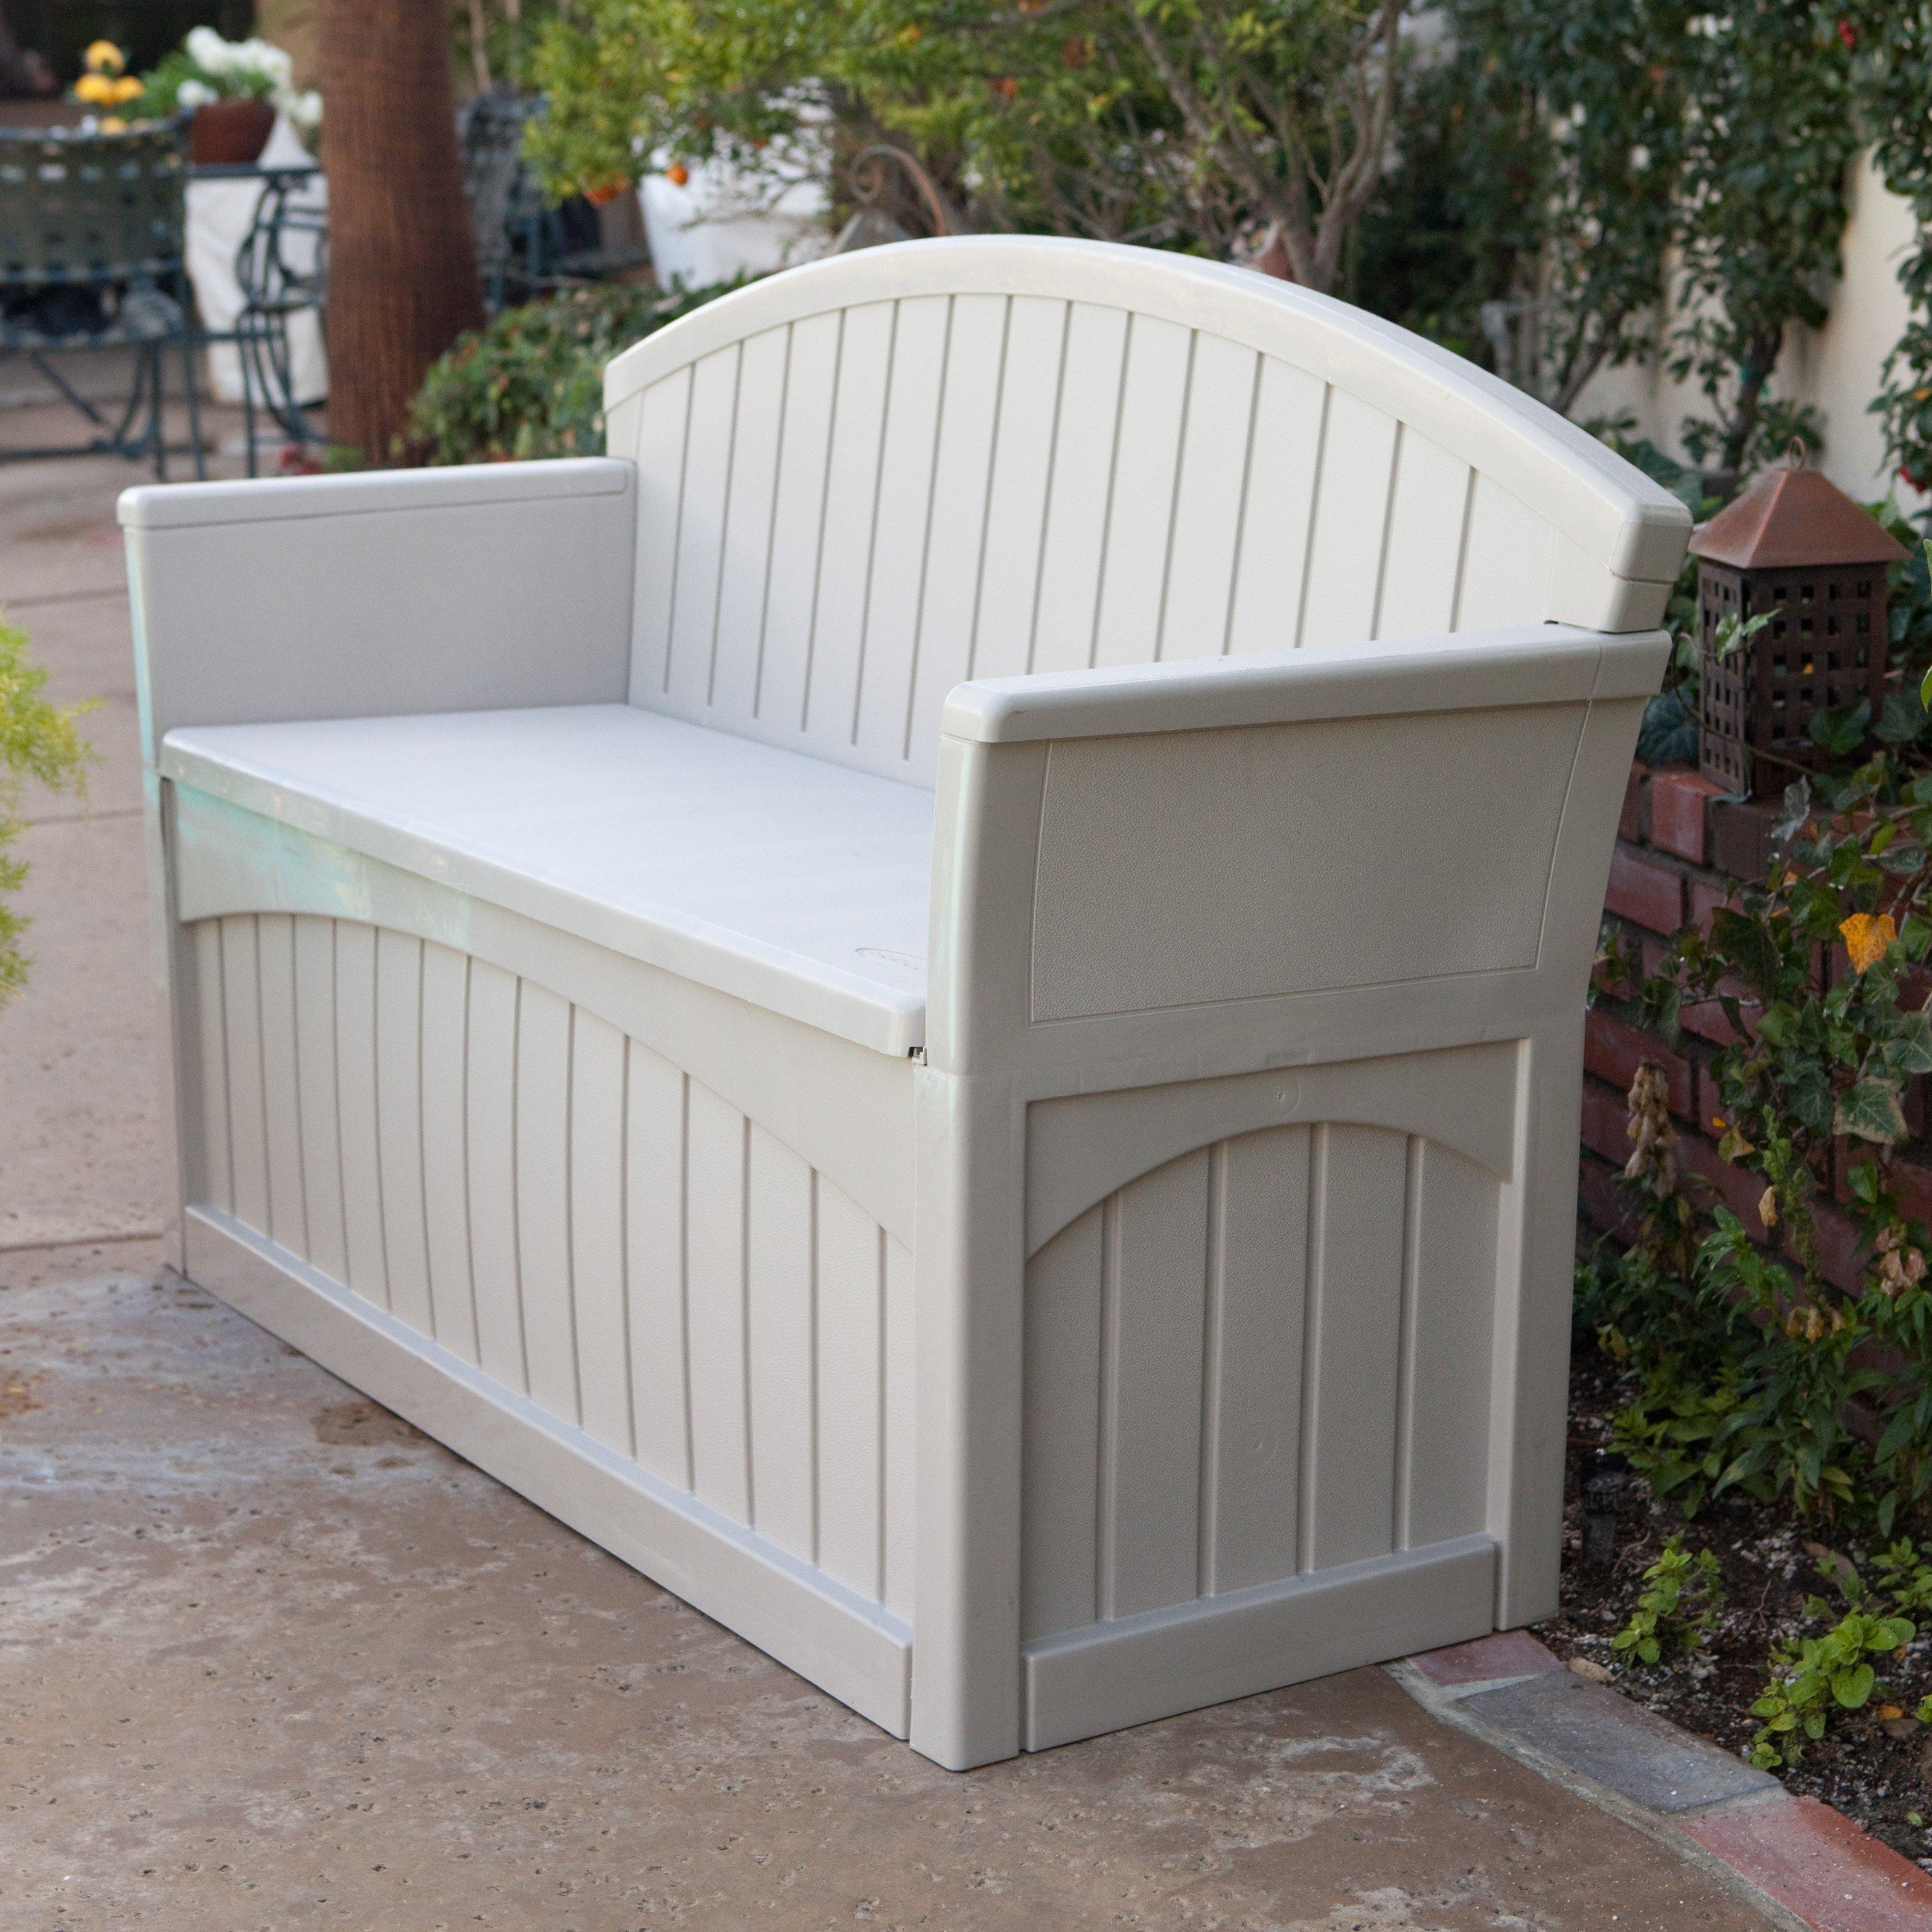 Cool Suncast 50 Gallon Patio Bench - Walmart.com suncast patio storage bench